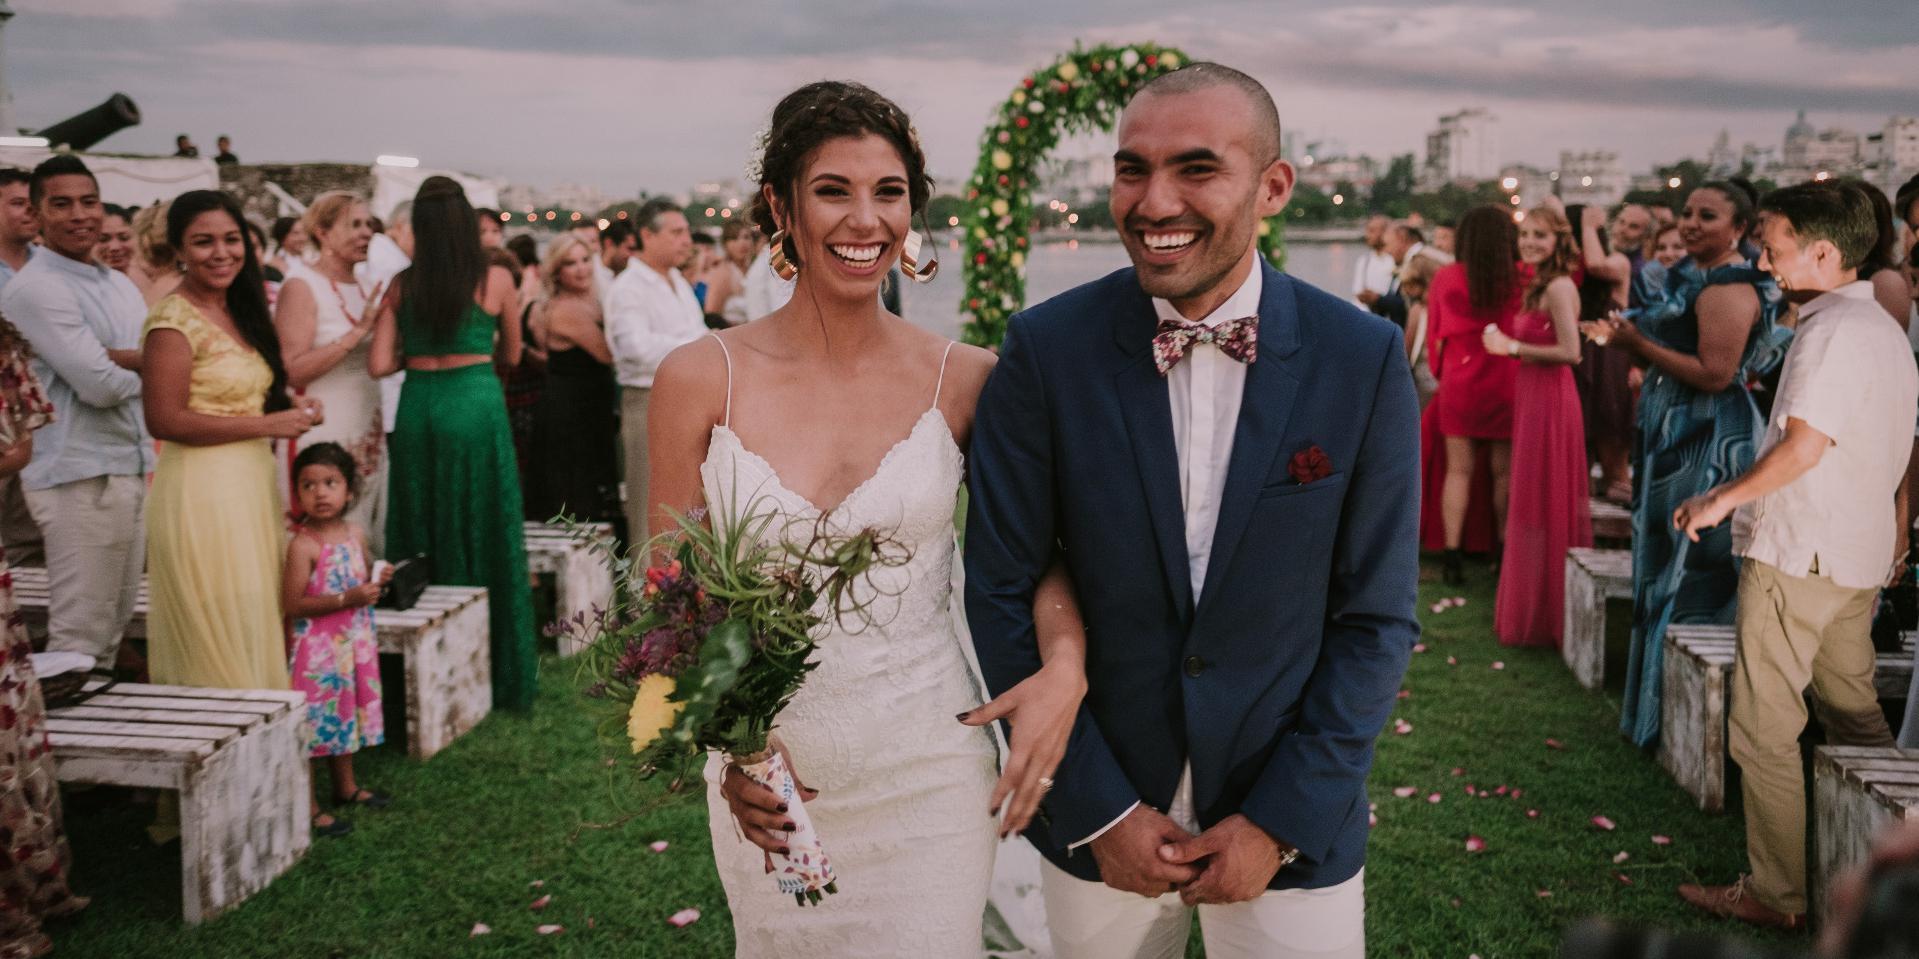 bodas-sin-clasificar-sin-tema-cuba-29351.jpg